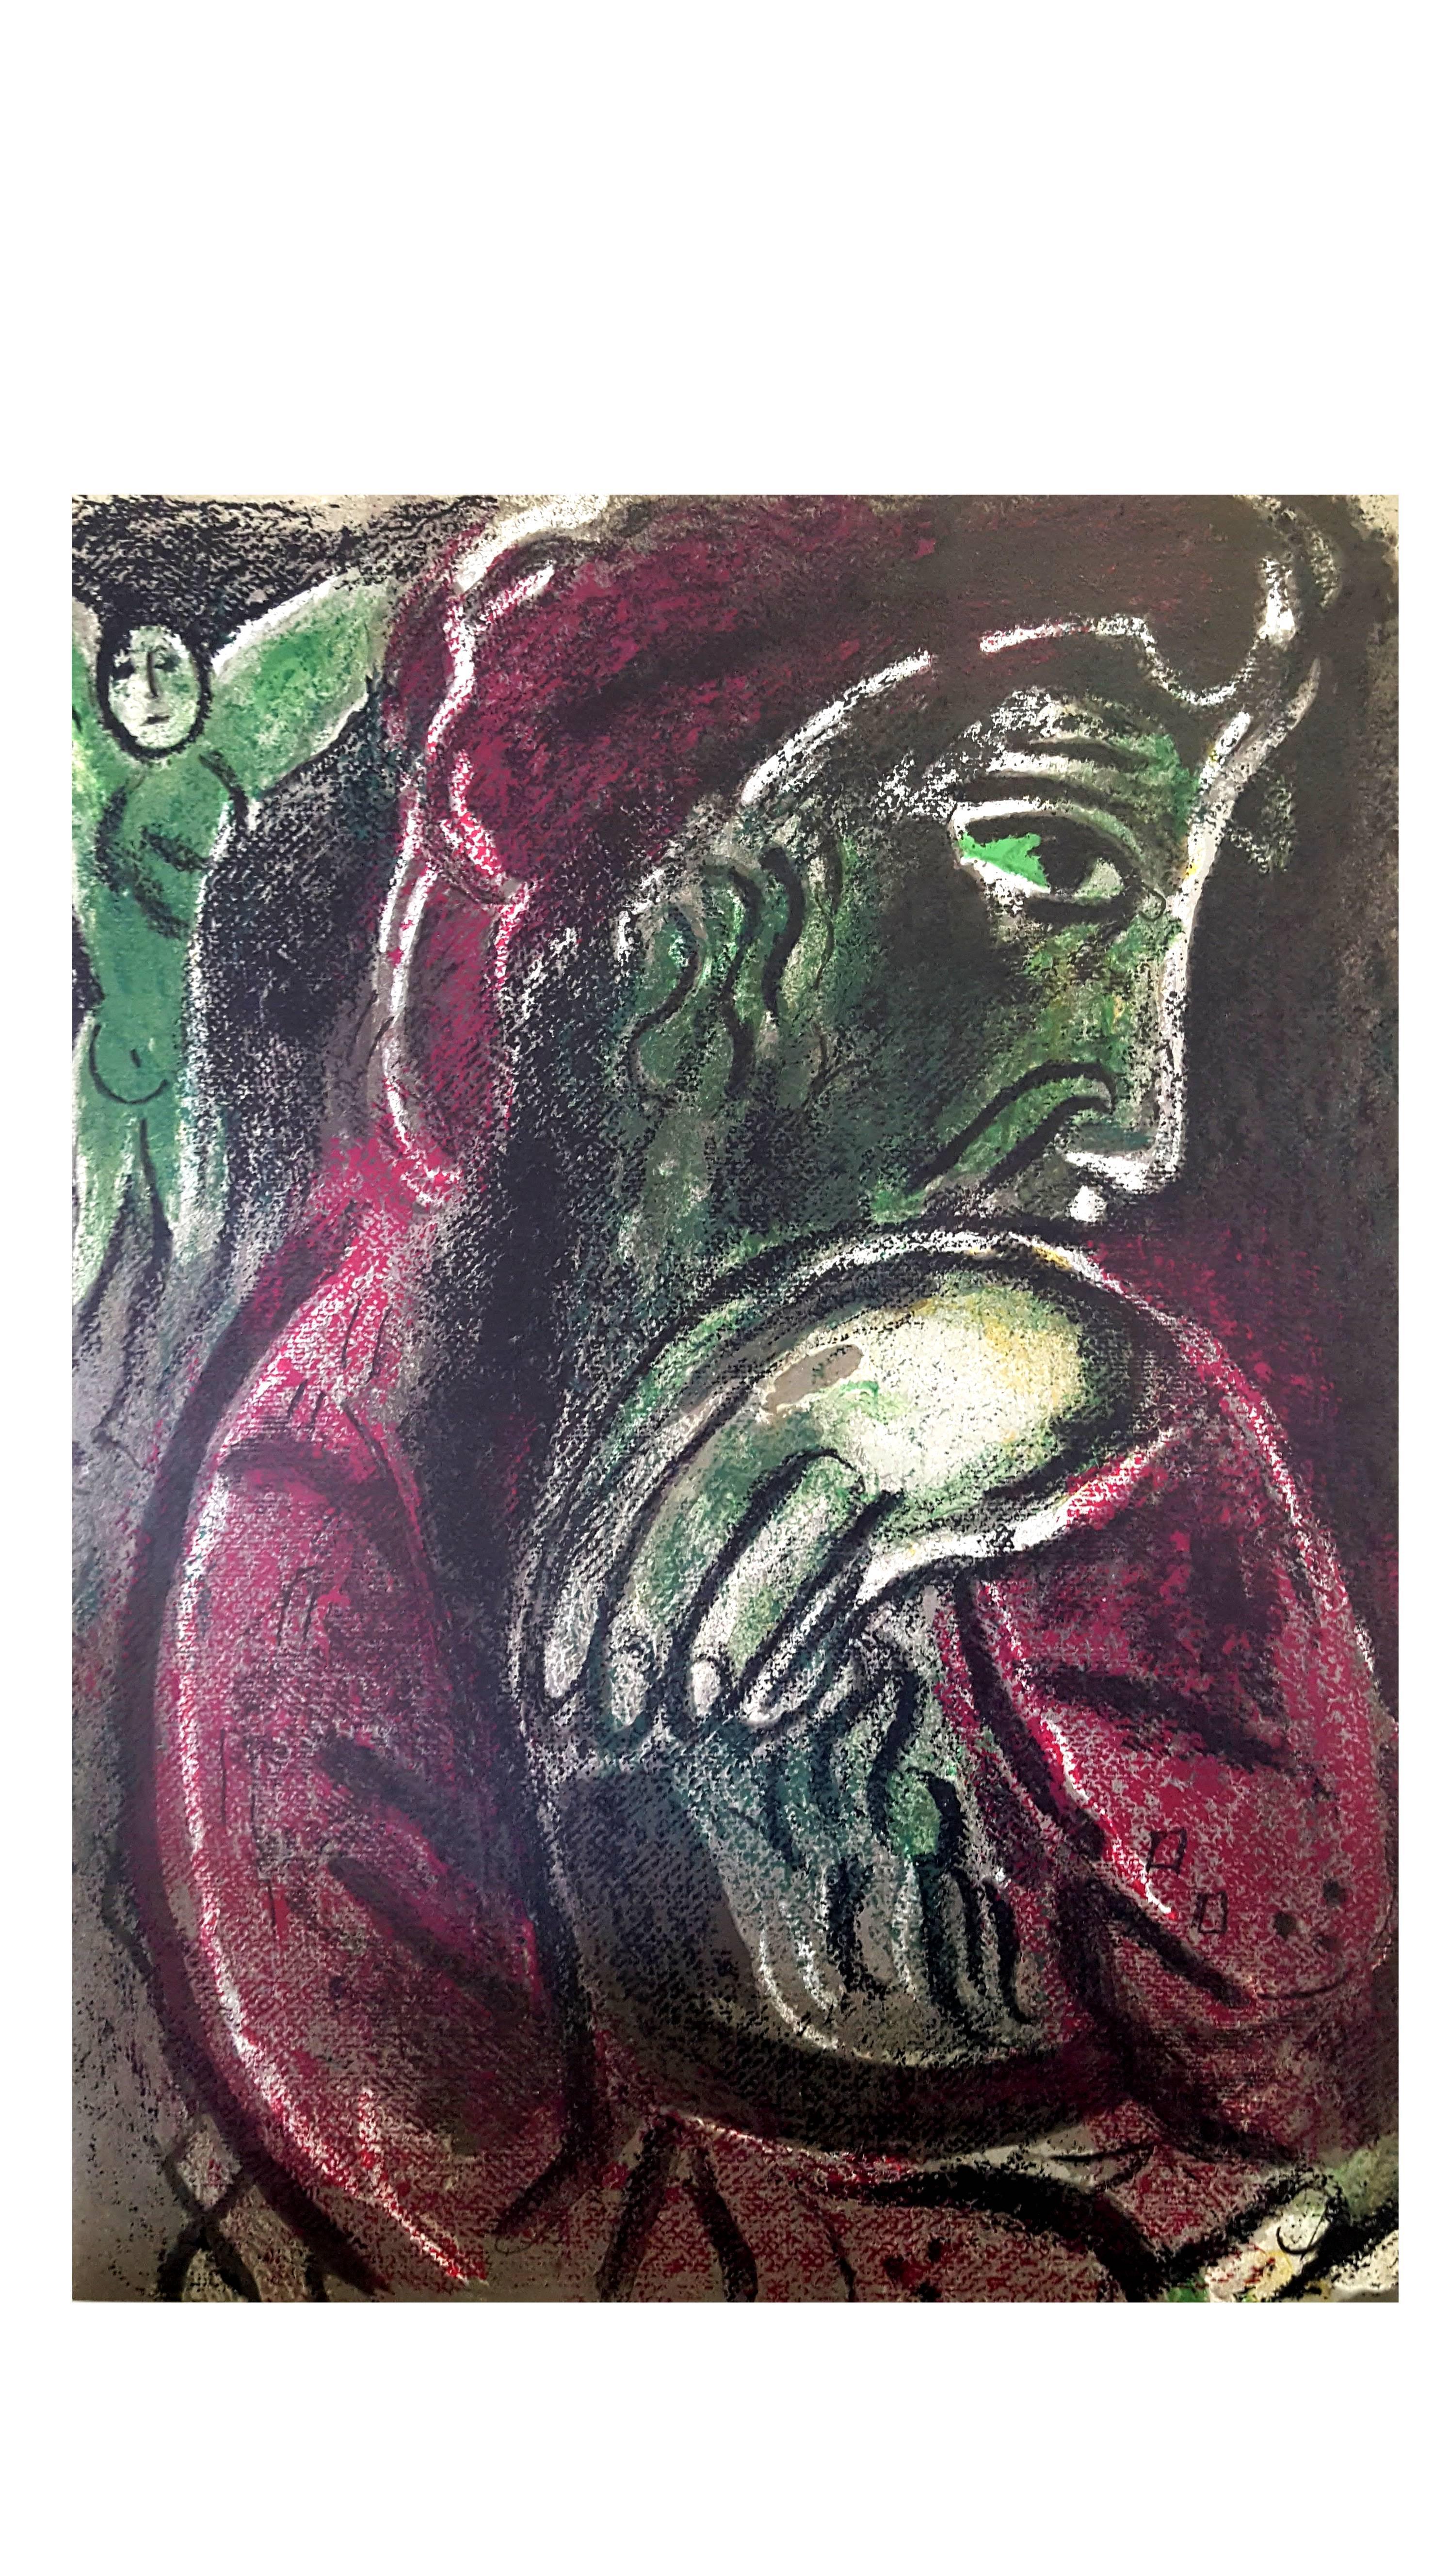 Marc Chagall - The Bible - Job - Original Lithograph